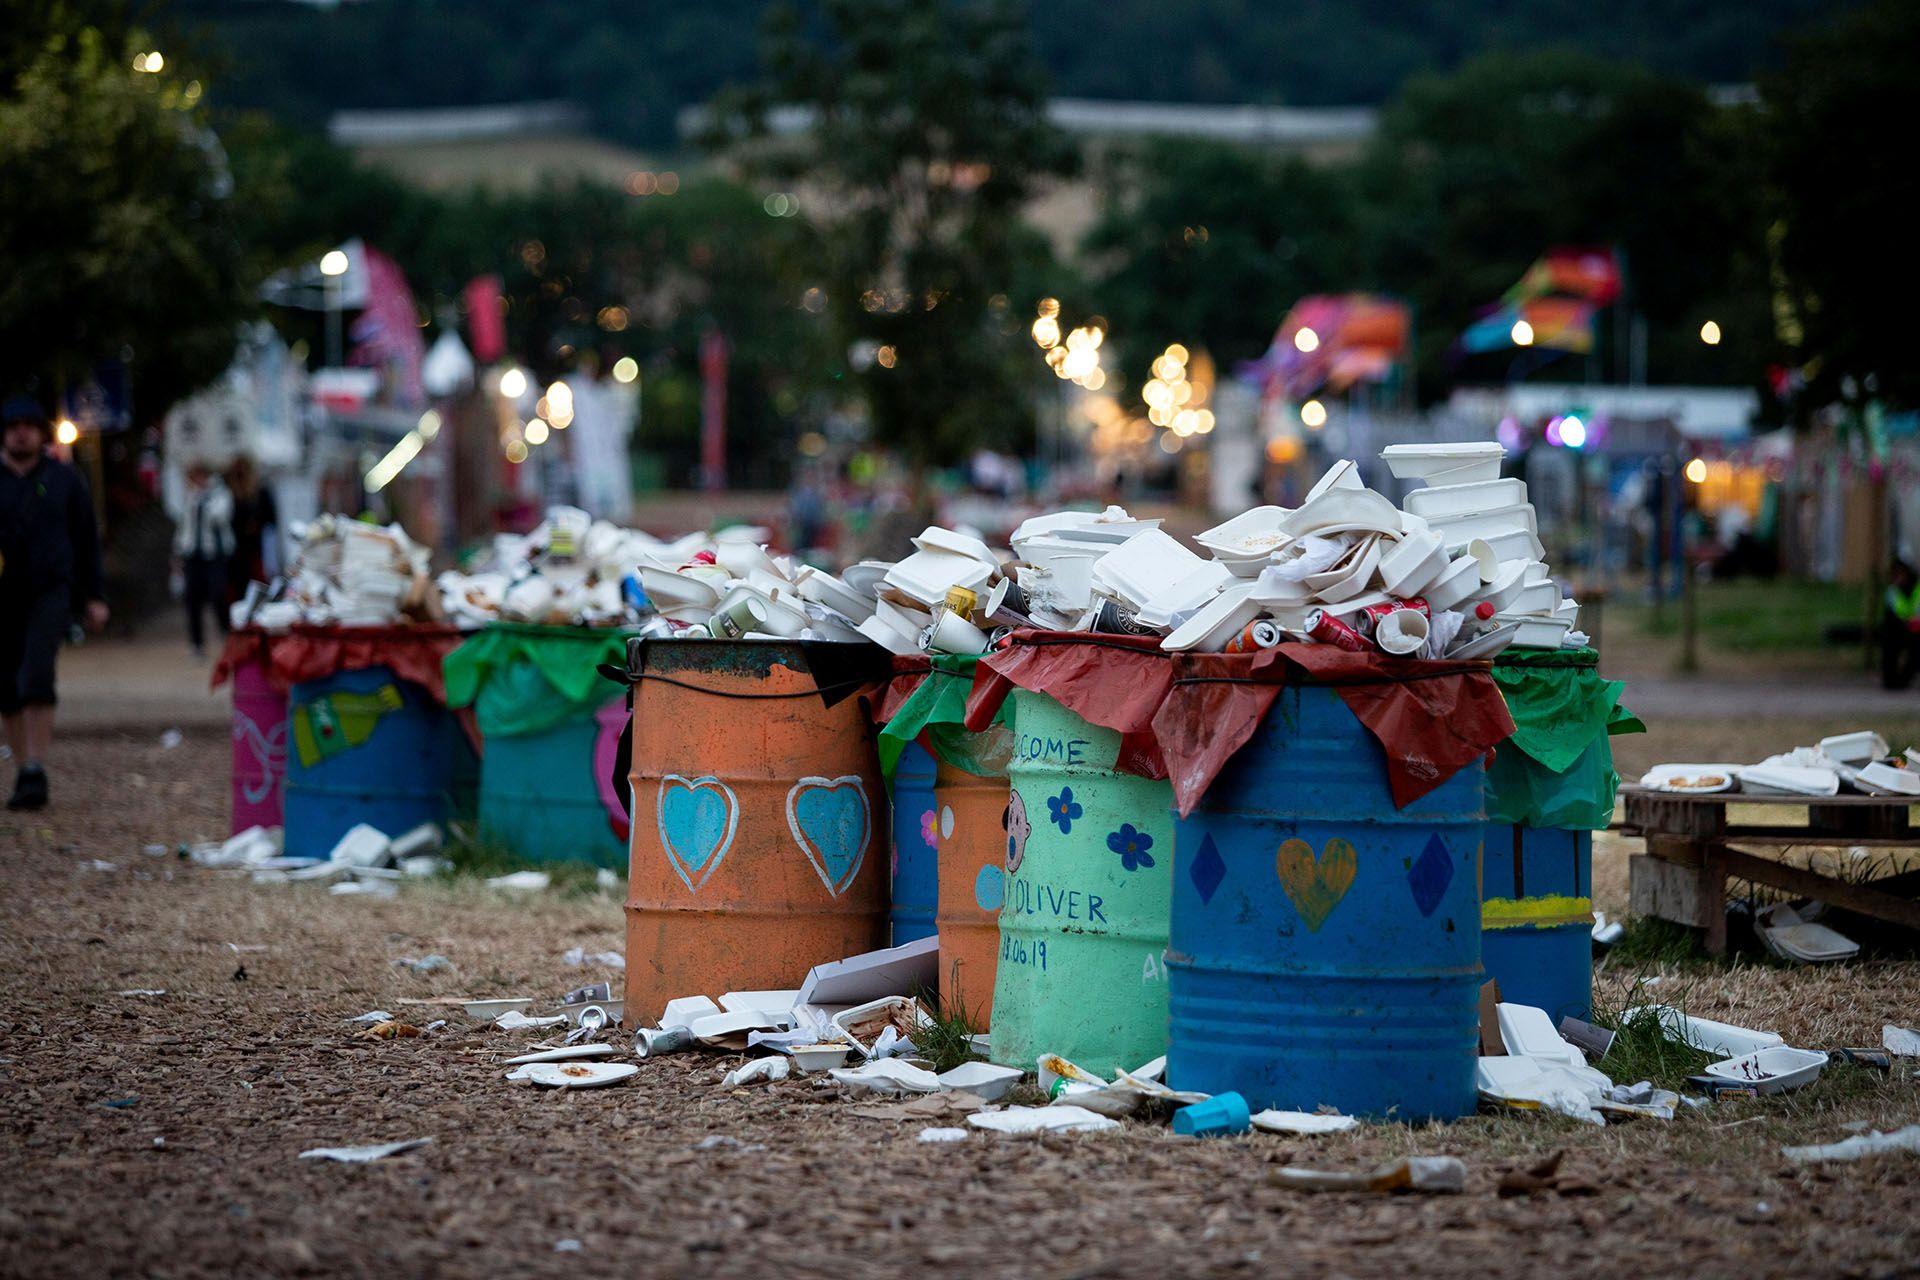 Image may contain: Can, Tin, Trash, Human, Person